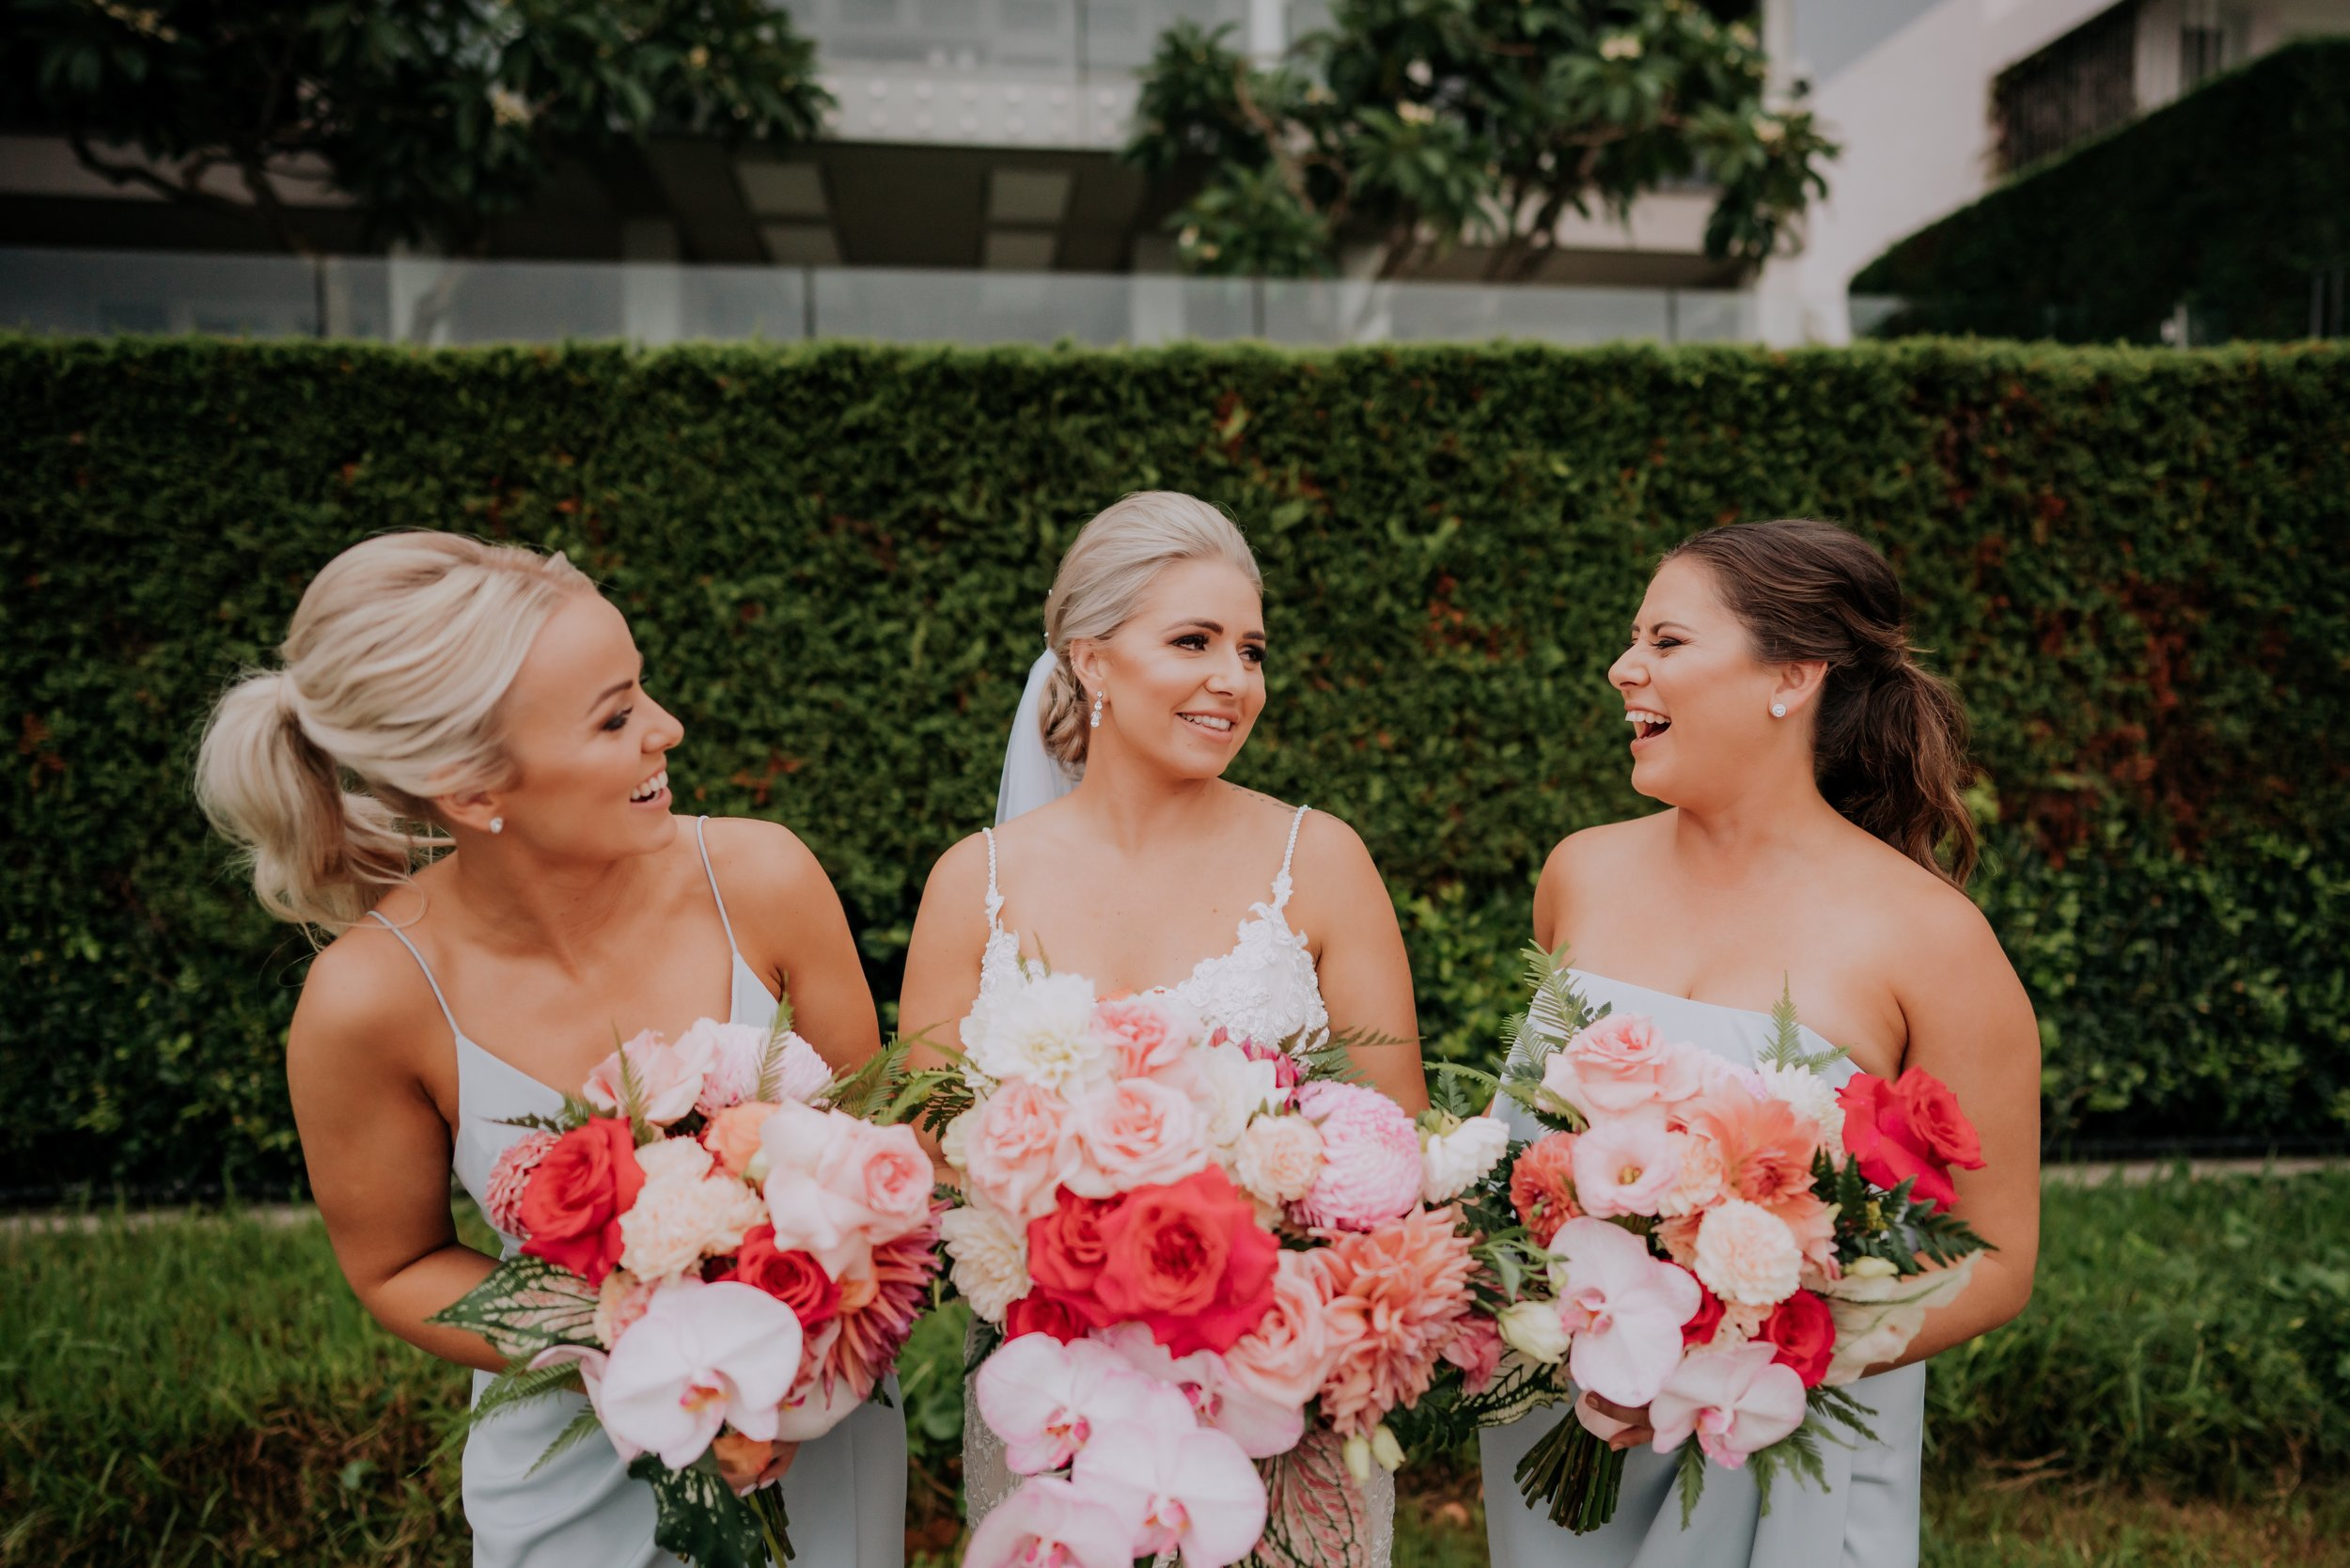 ava-me-photography-gemma-brent-zest-point-piper-sydney-wedding-410.jpg